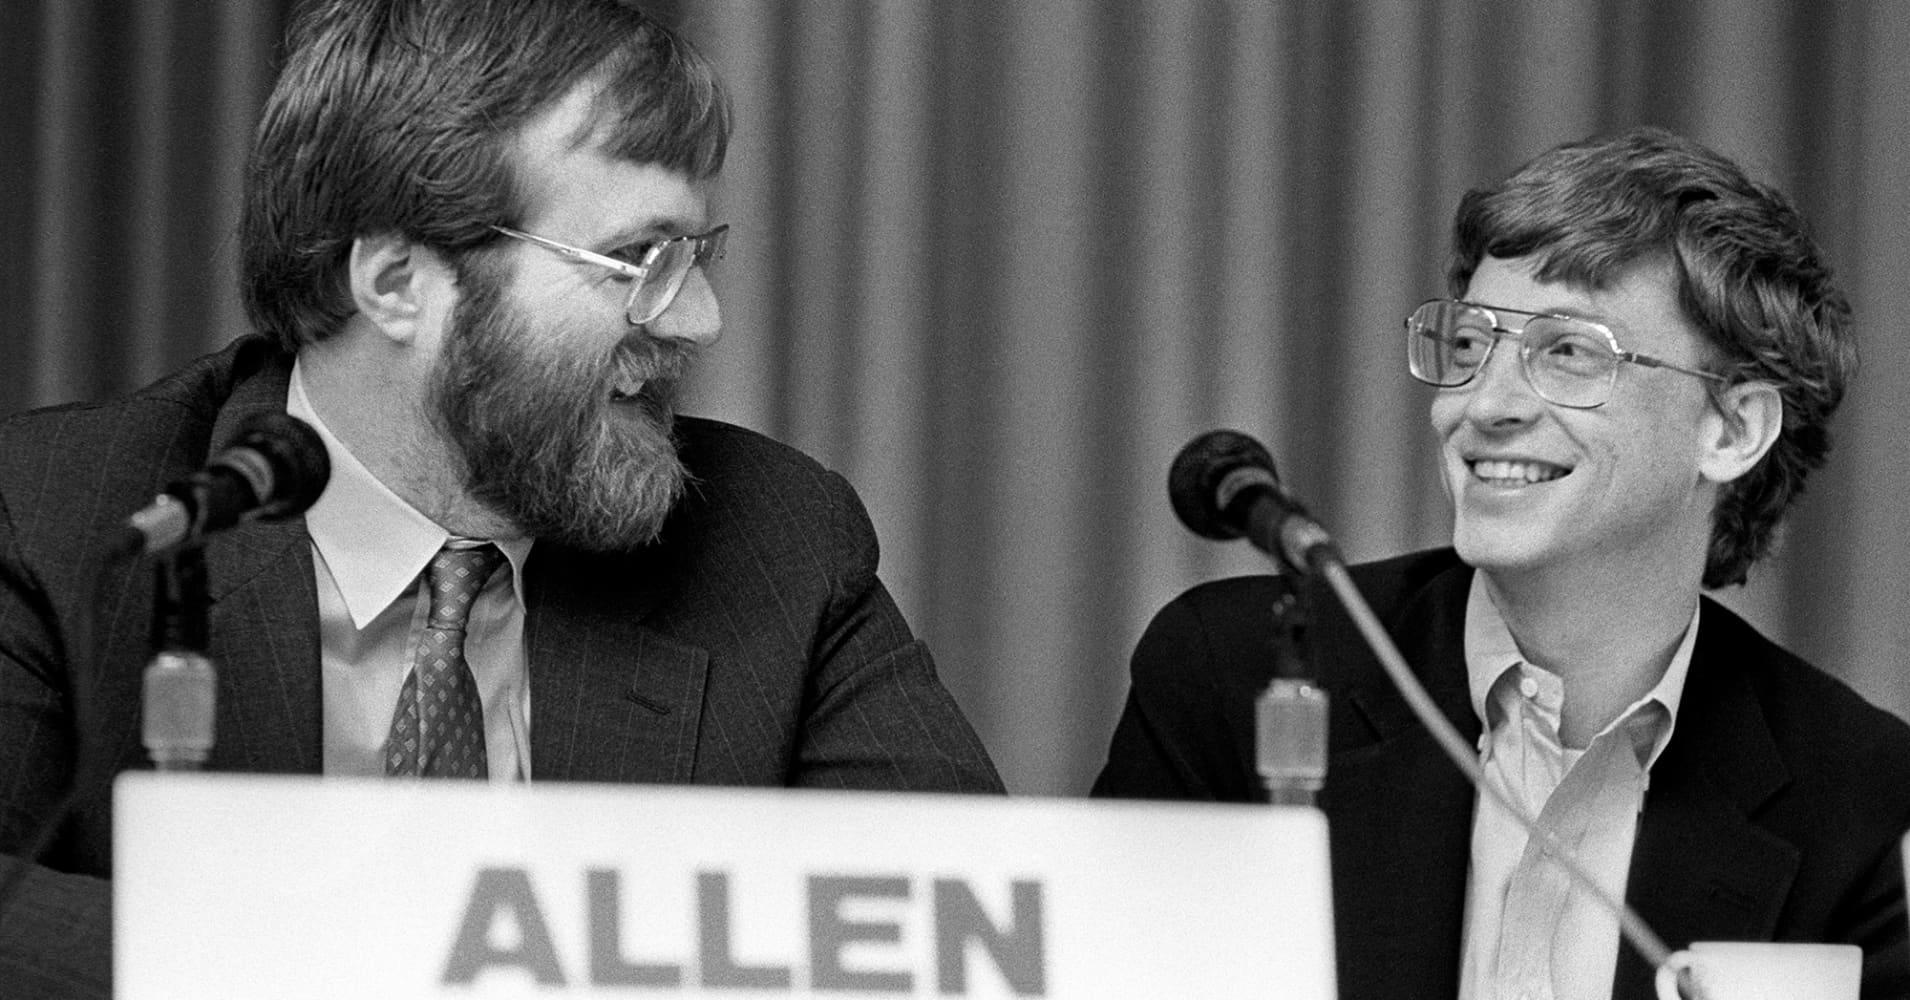 Paul Allen, left, and Bill Gates in 1987